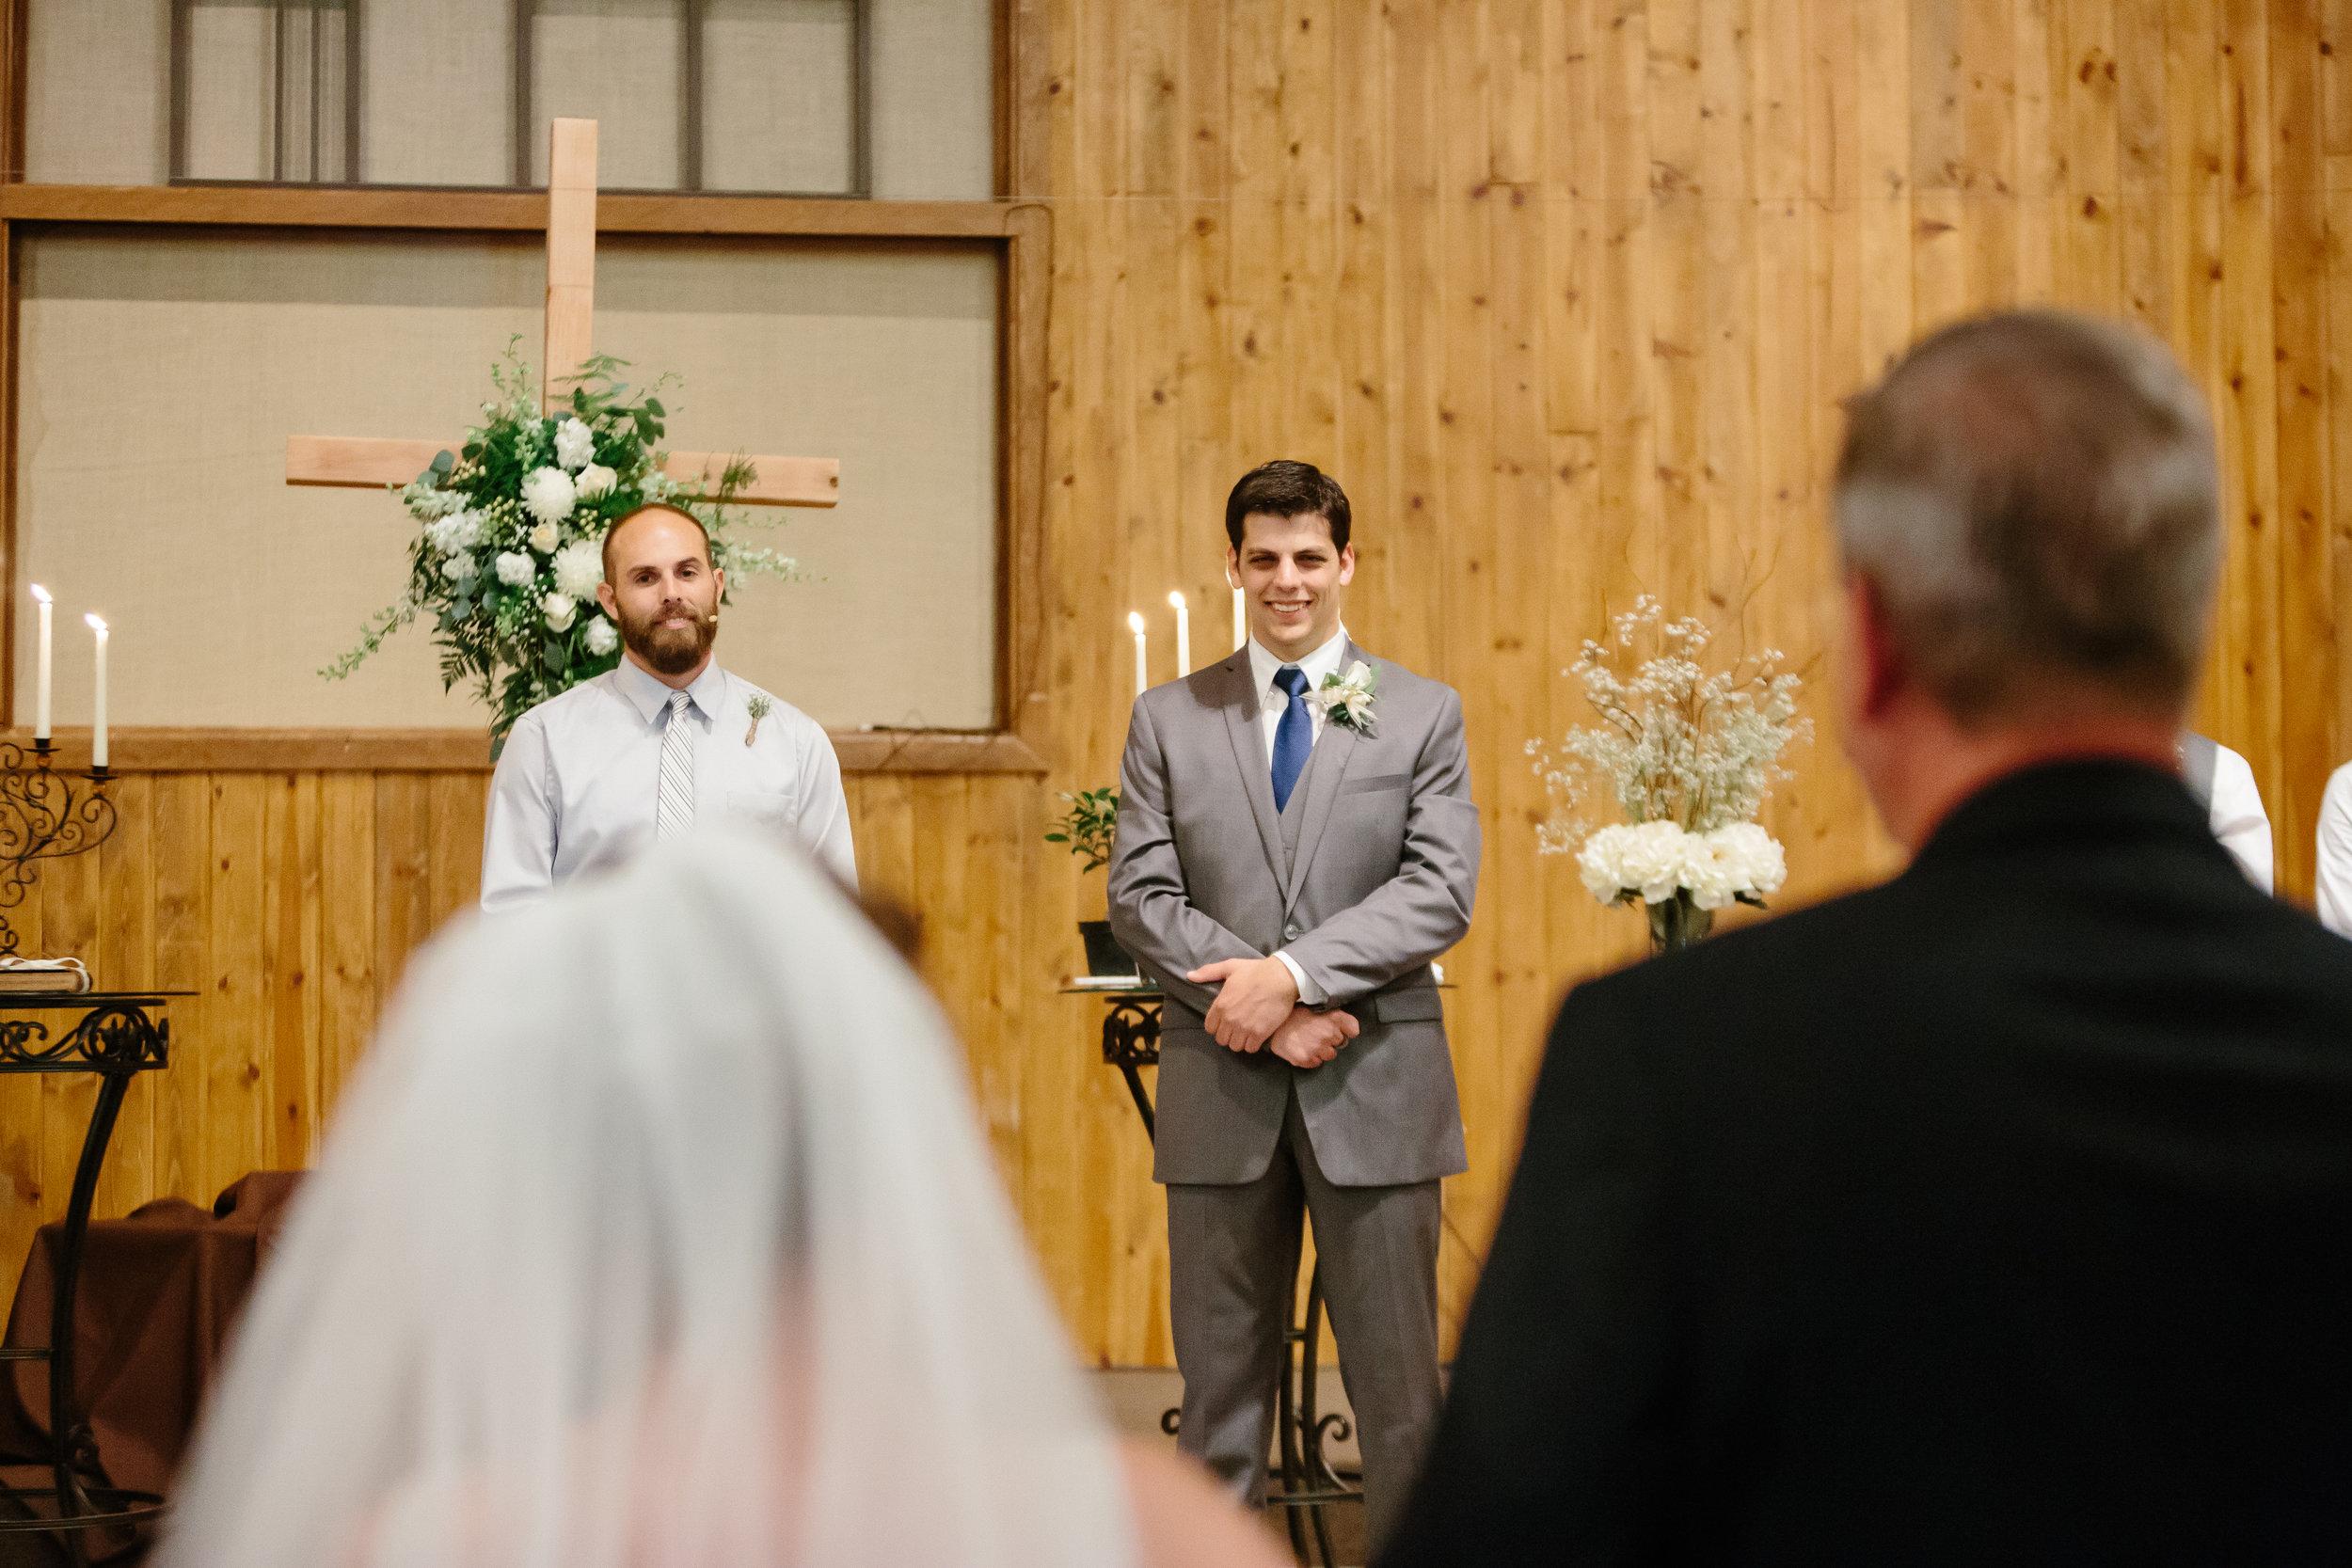 Jordan & Shantel Married - Idaho - Corrie Mick Photography-210.jpg